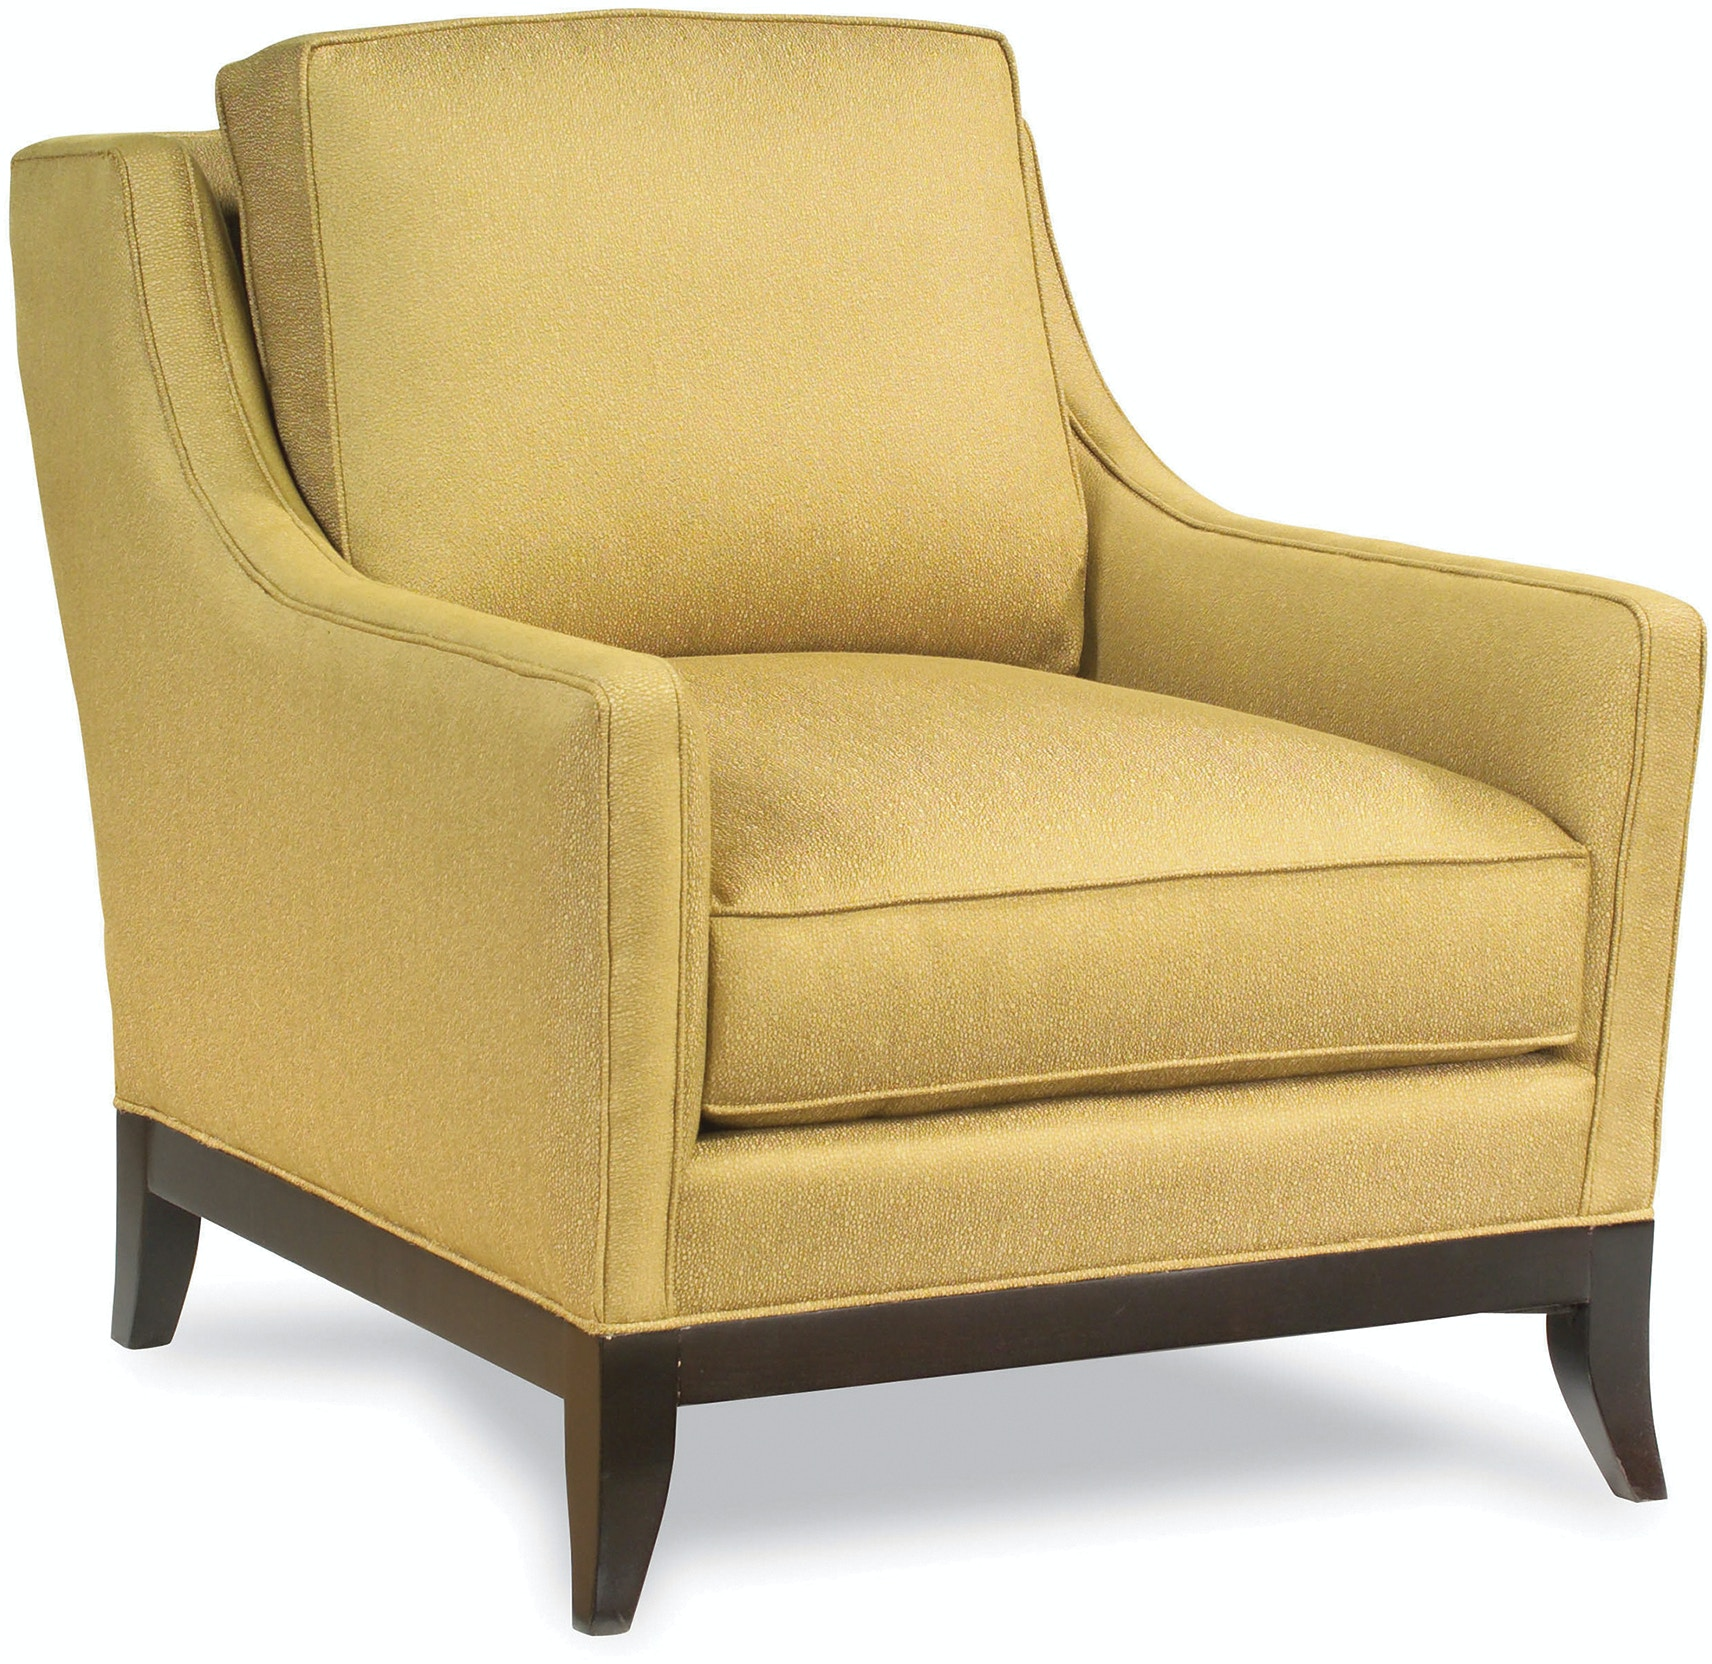 Taylor King Living Room Ashbery Chair 1003 01 Giorgi  : 1003 01508 14 20148 24 47am1hr from www.giorgibros.com size 1024 x 768 jpeg 53kB